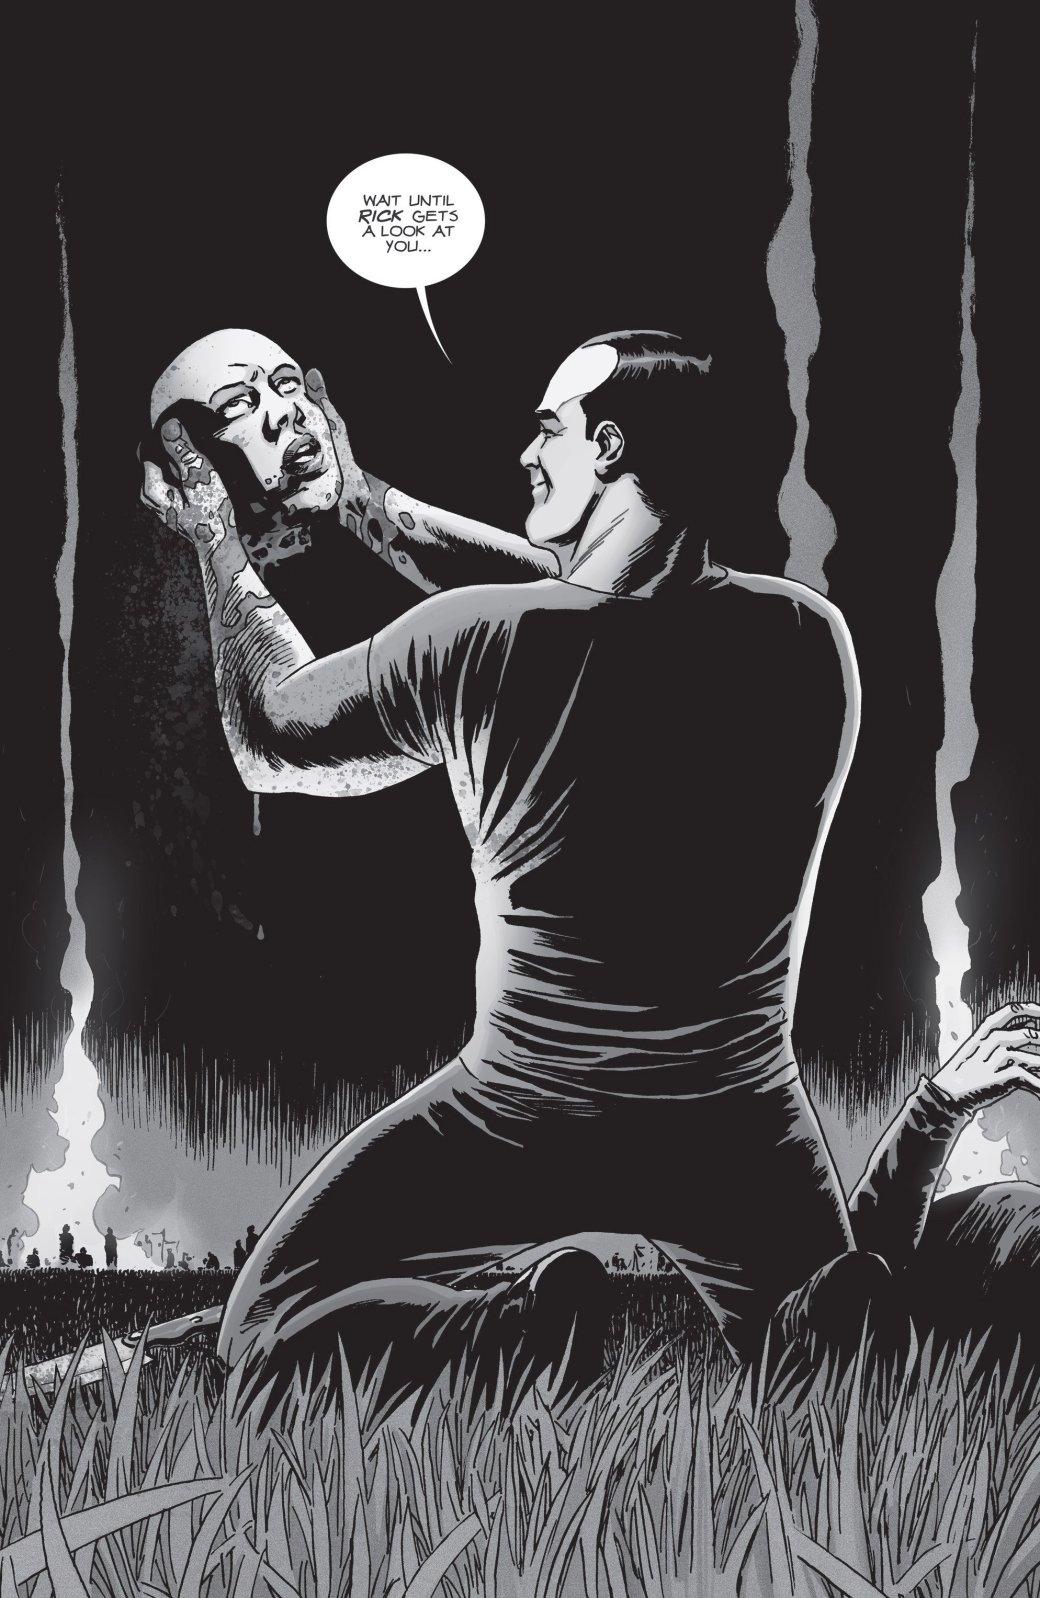 Война с Шепчущимися в комиксе The Walking Dead не оправдала ожиданий | Канобу - Изображение 3